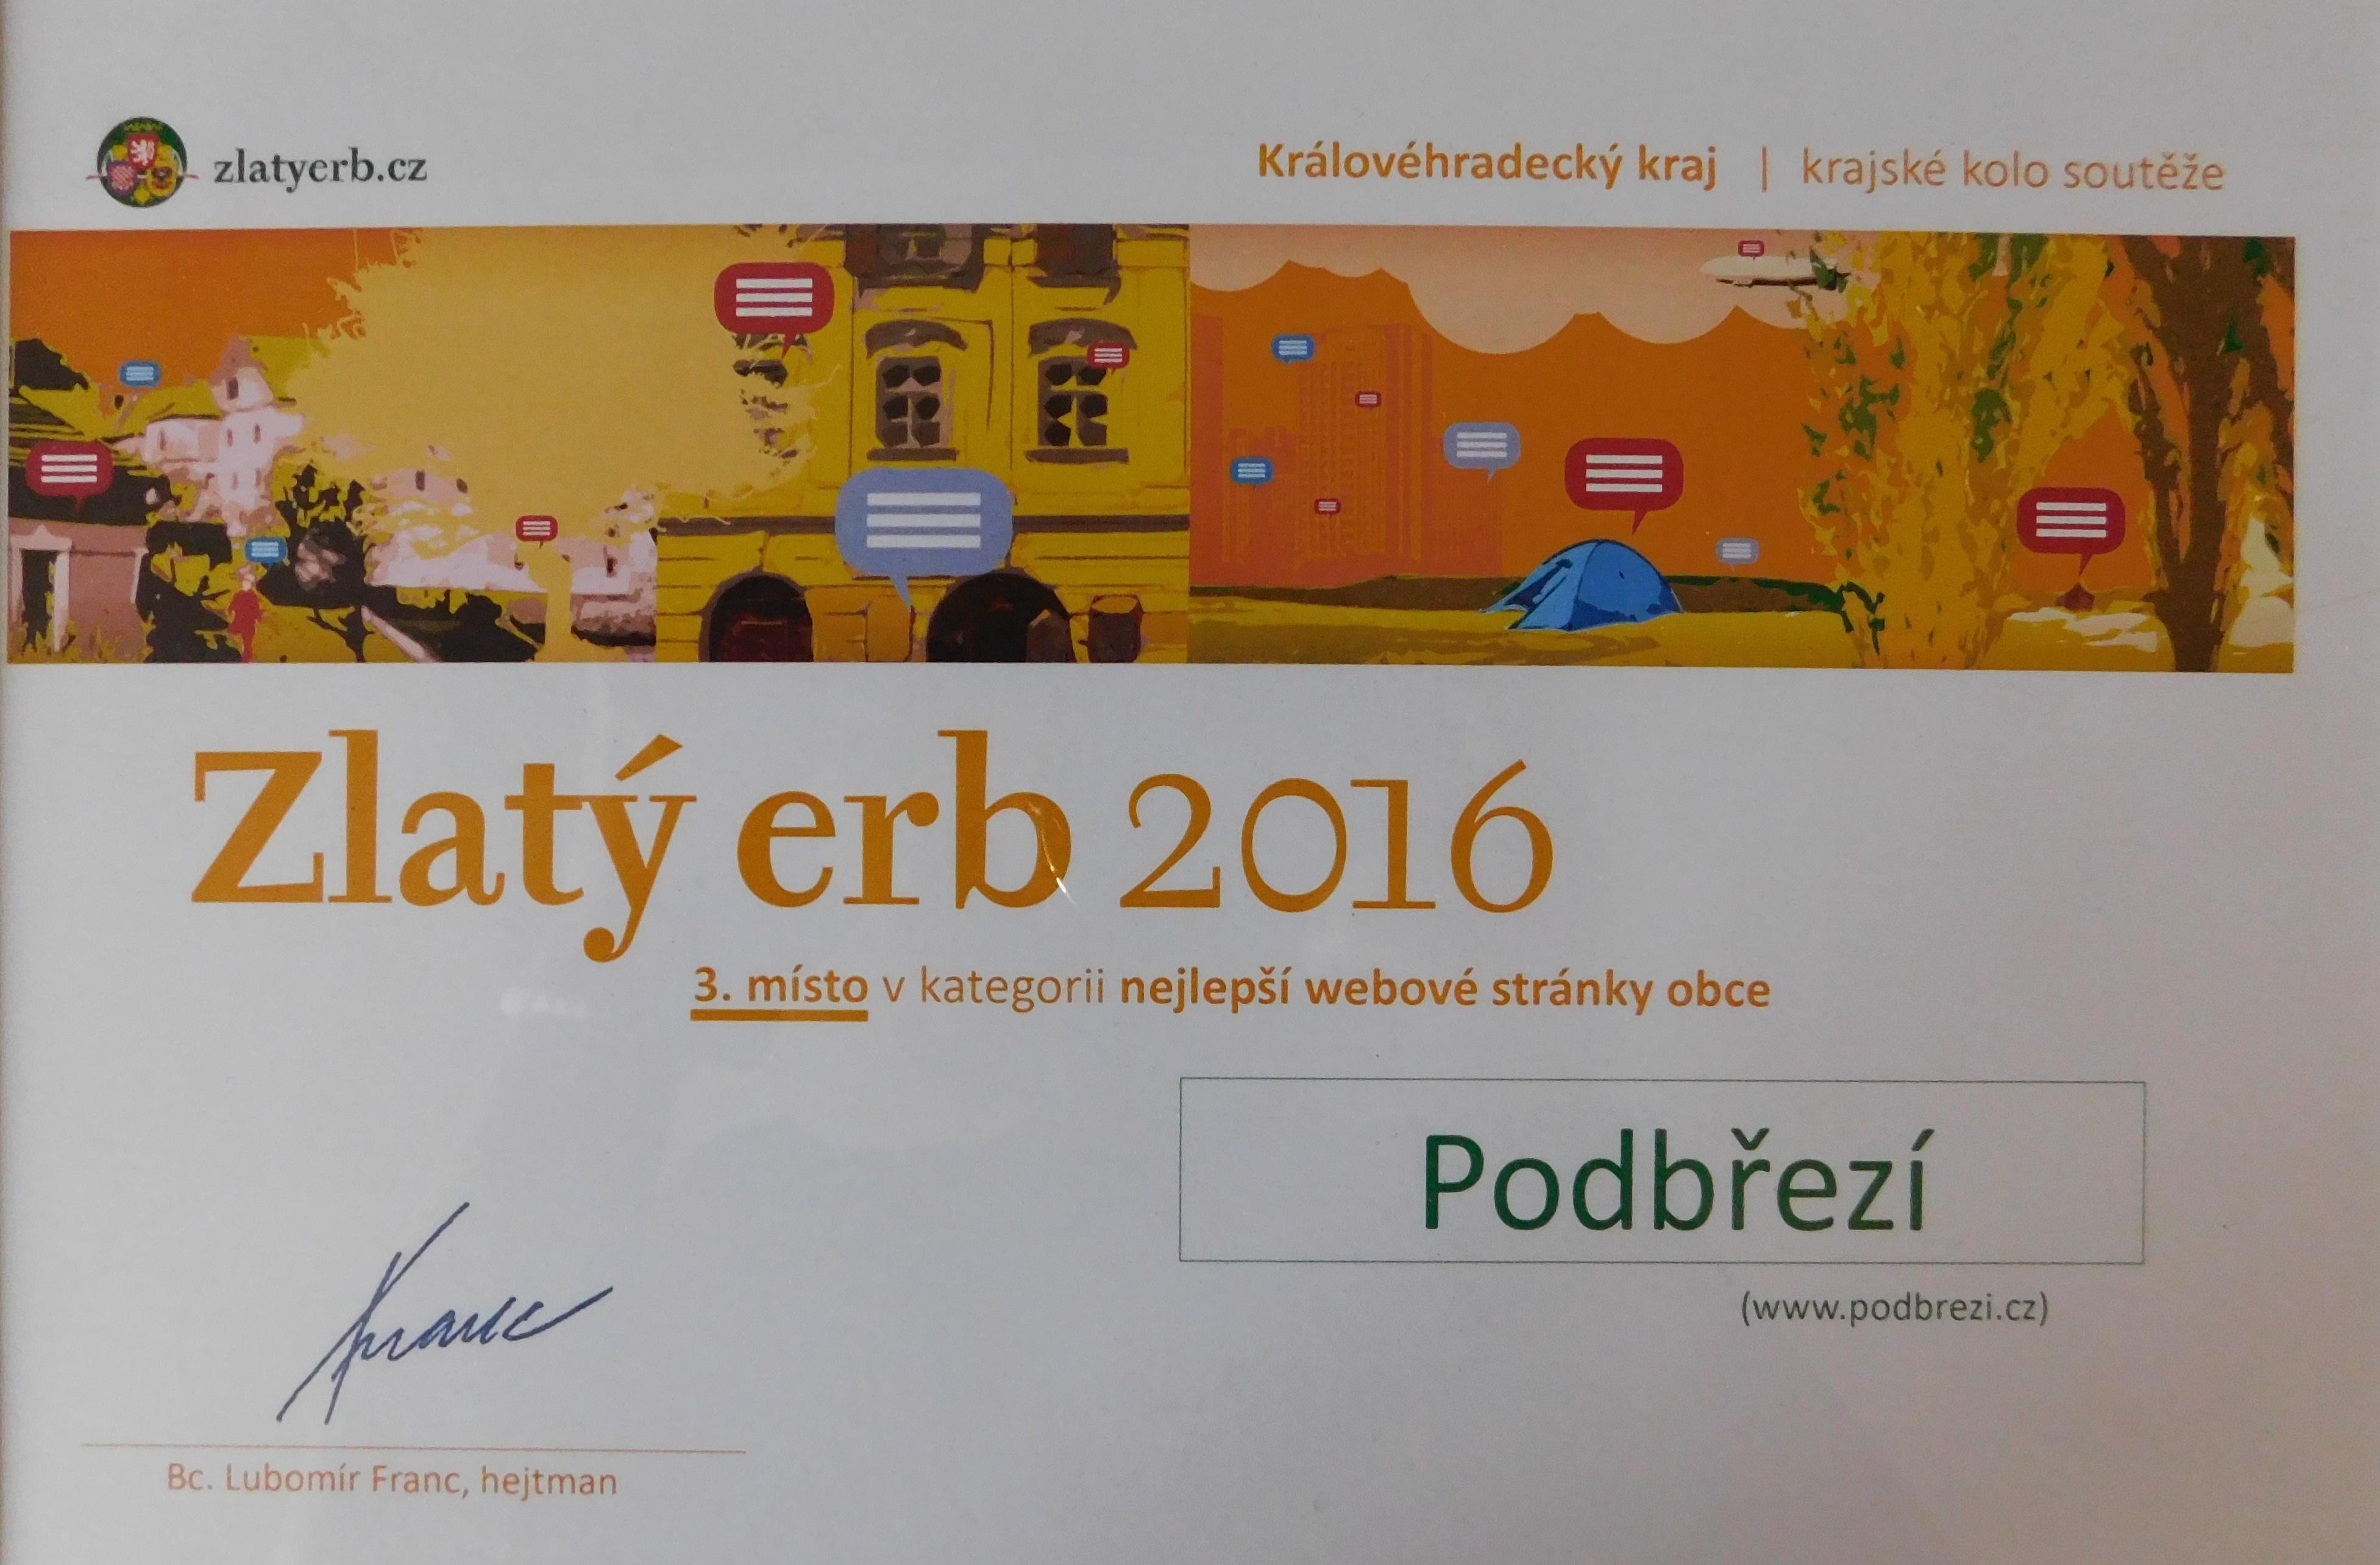 Diplom - Zlatý erb 2016